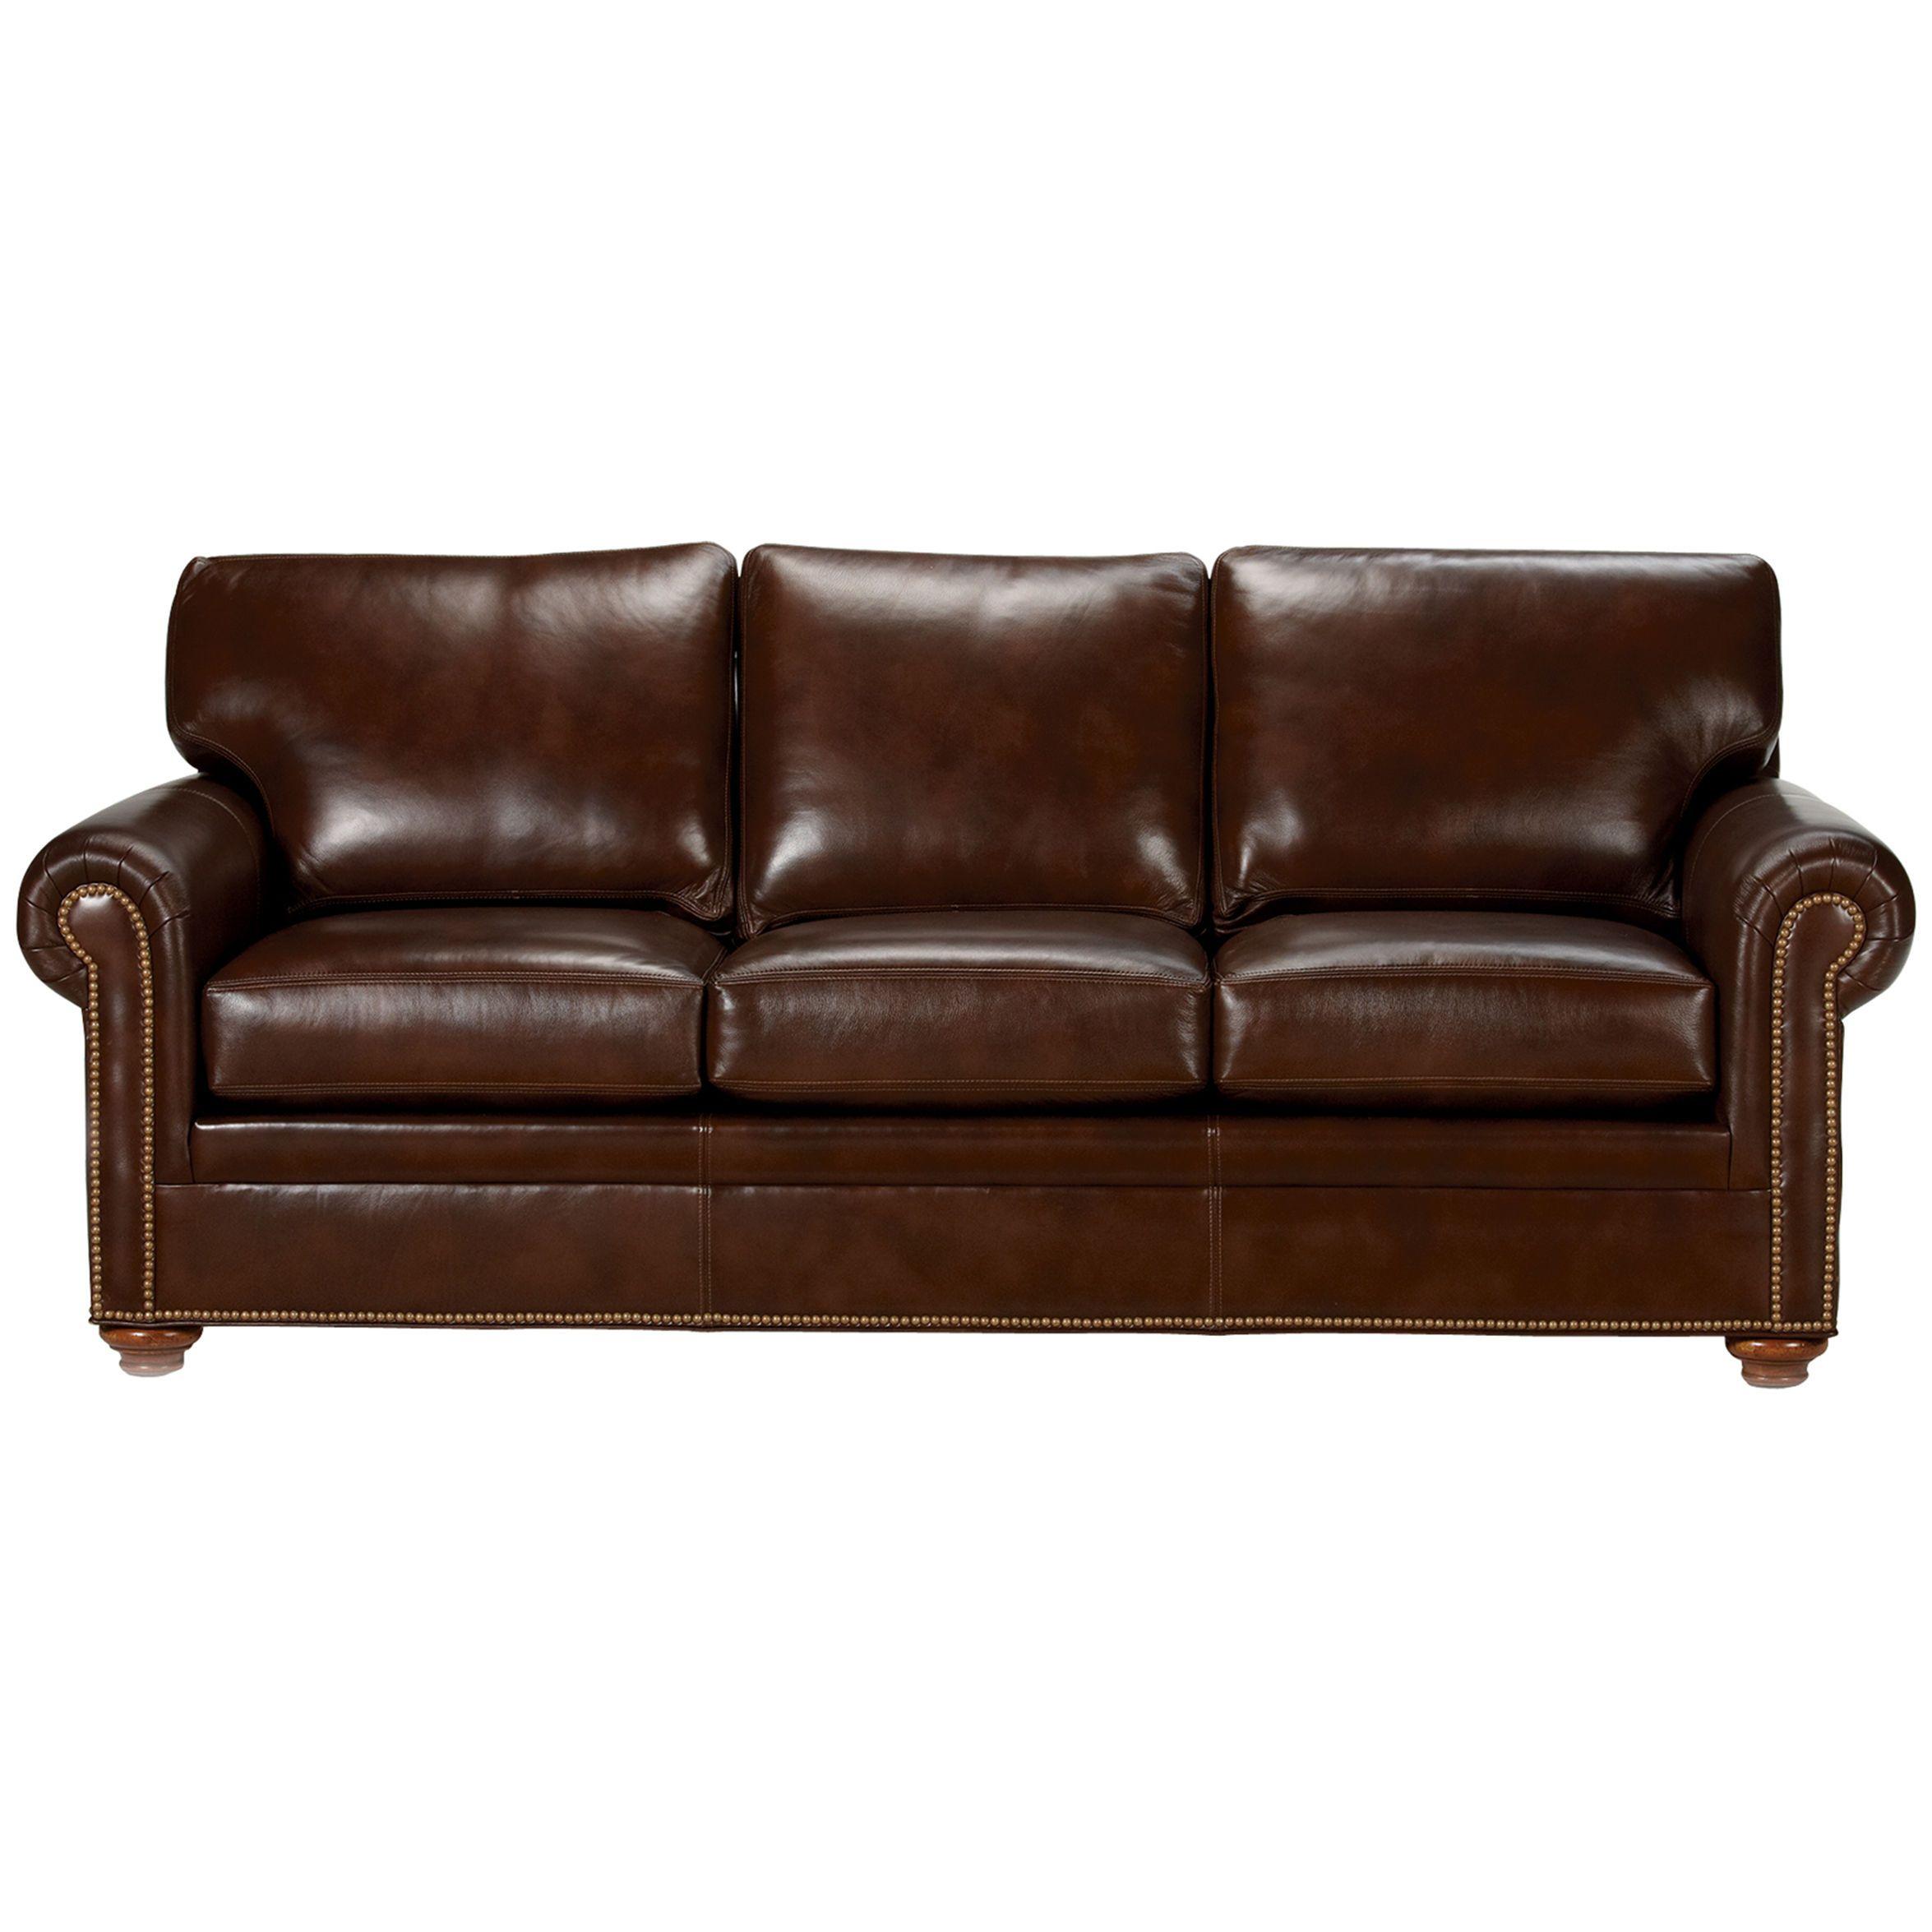 Conor Leather Sofa Omni Brown Leather Sofa Ethan Allen Sofa Sofa